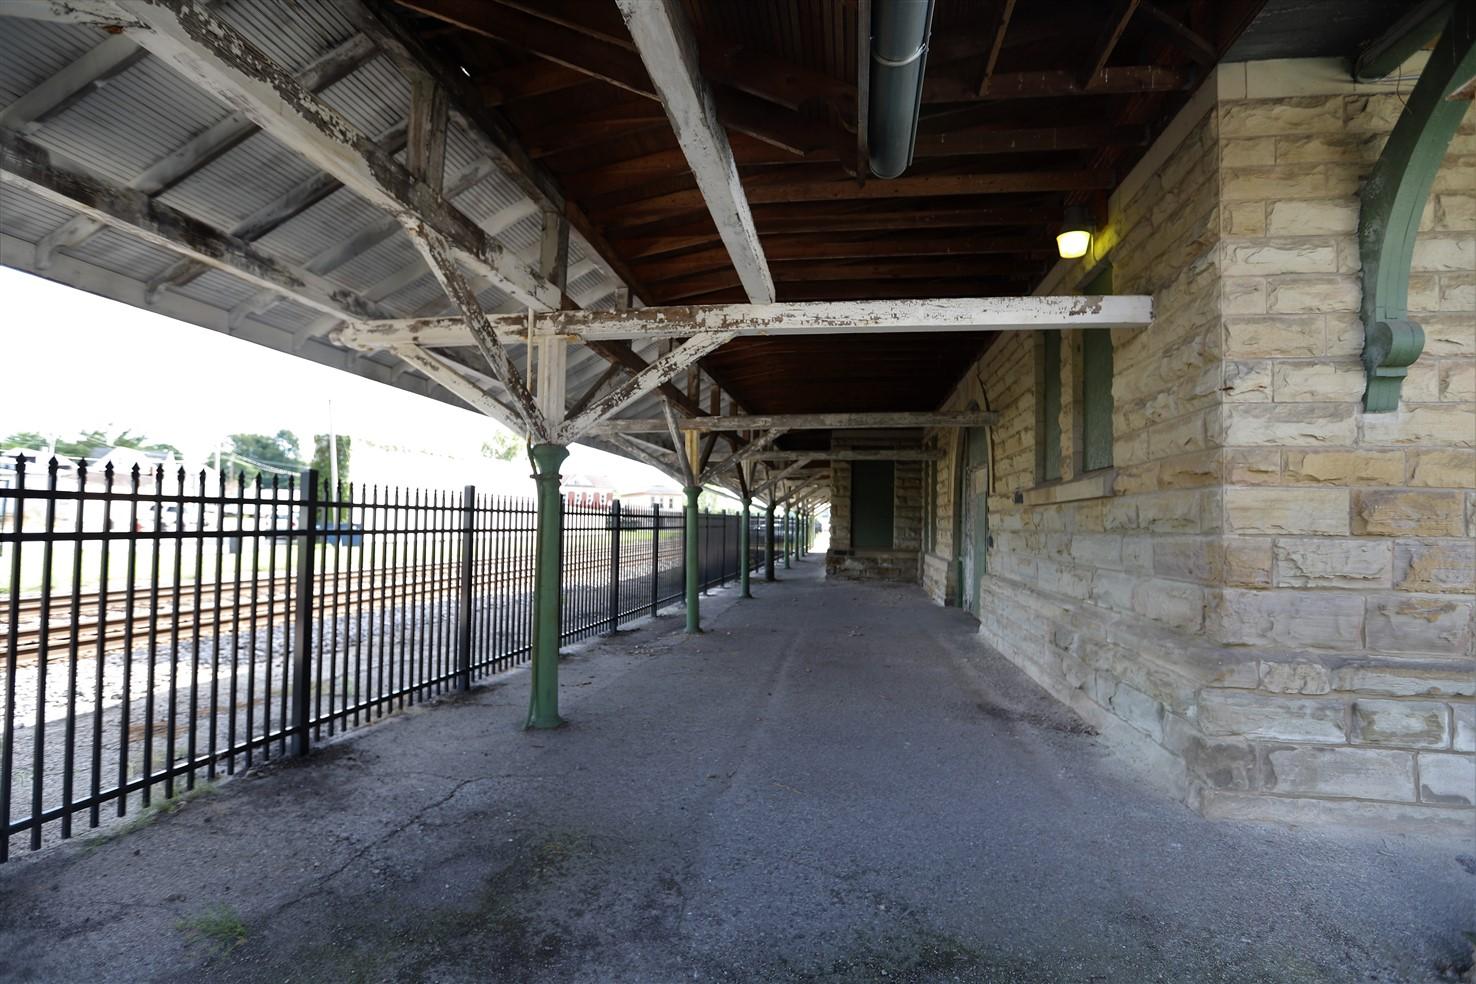 2018 09 15 66 Galion OH Train Station.jpg